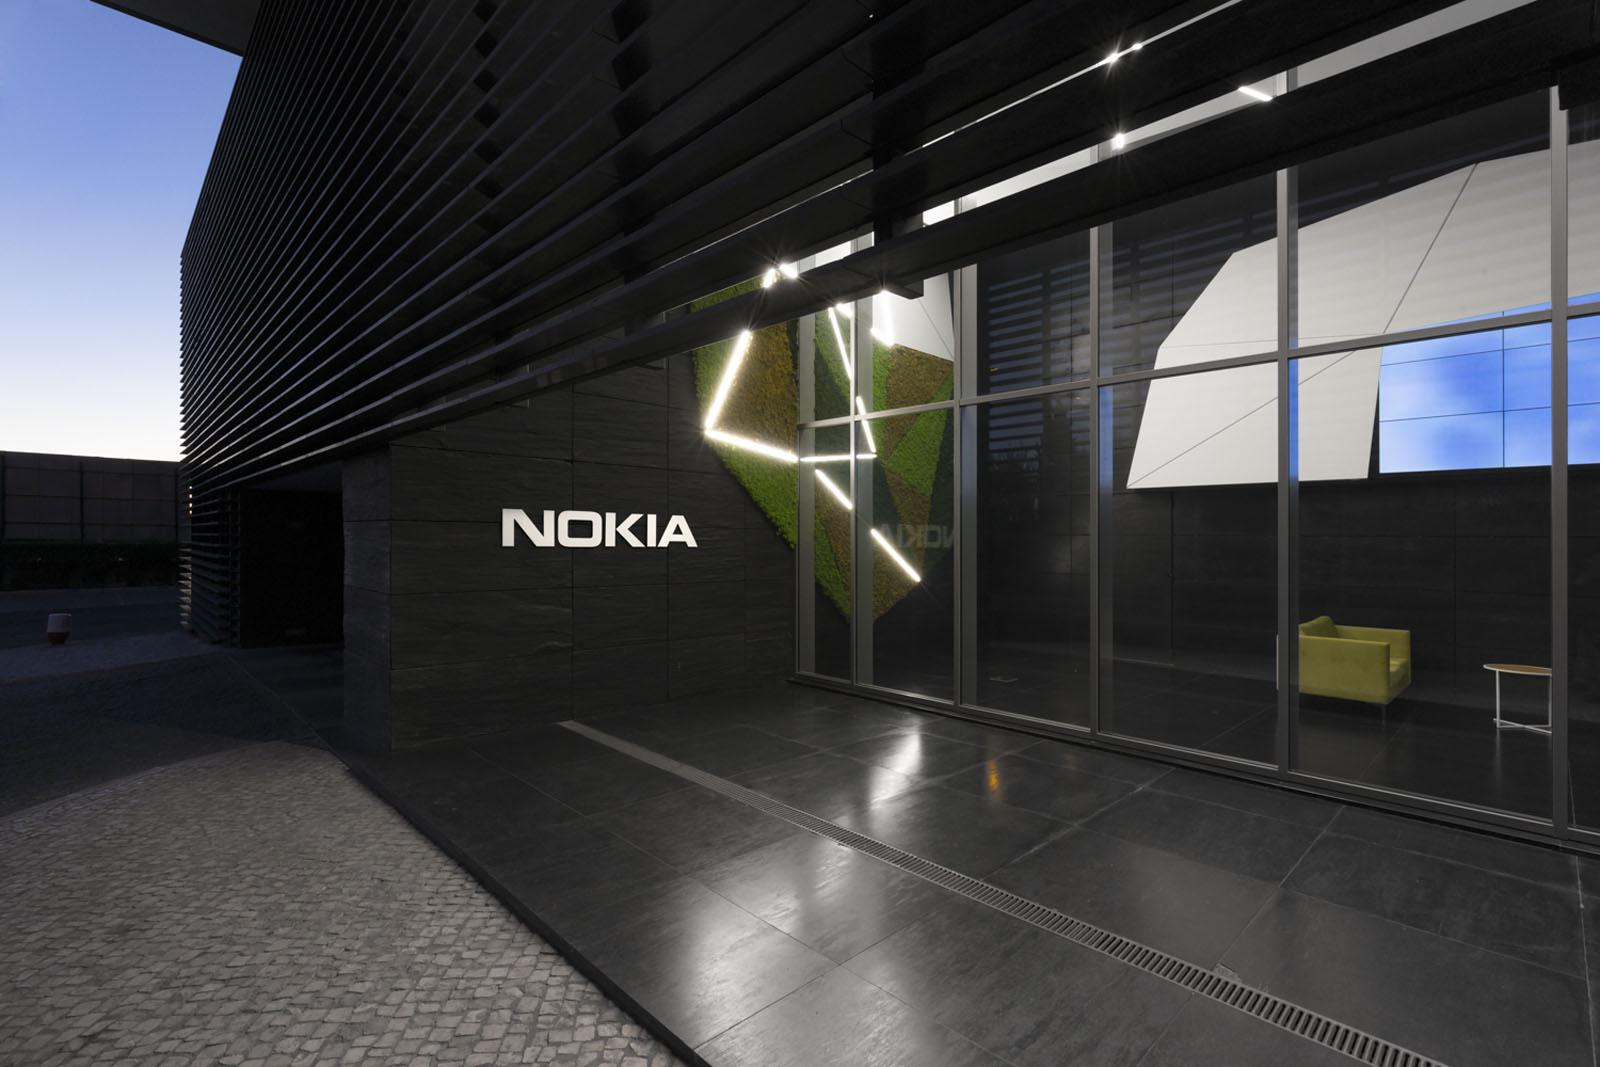 Nokia_20171111_0149_copy_LR.jpg